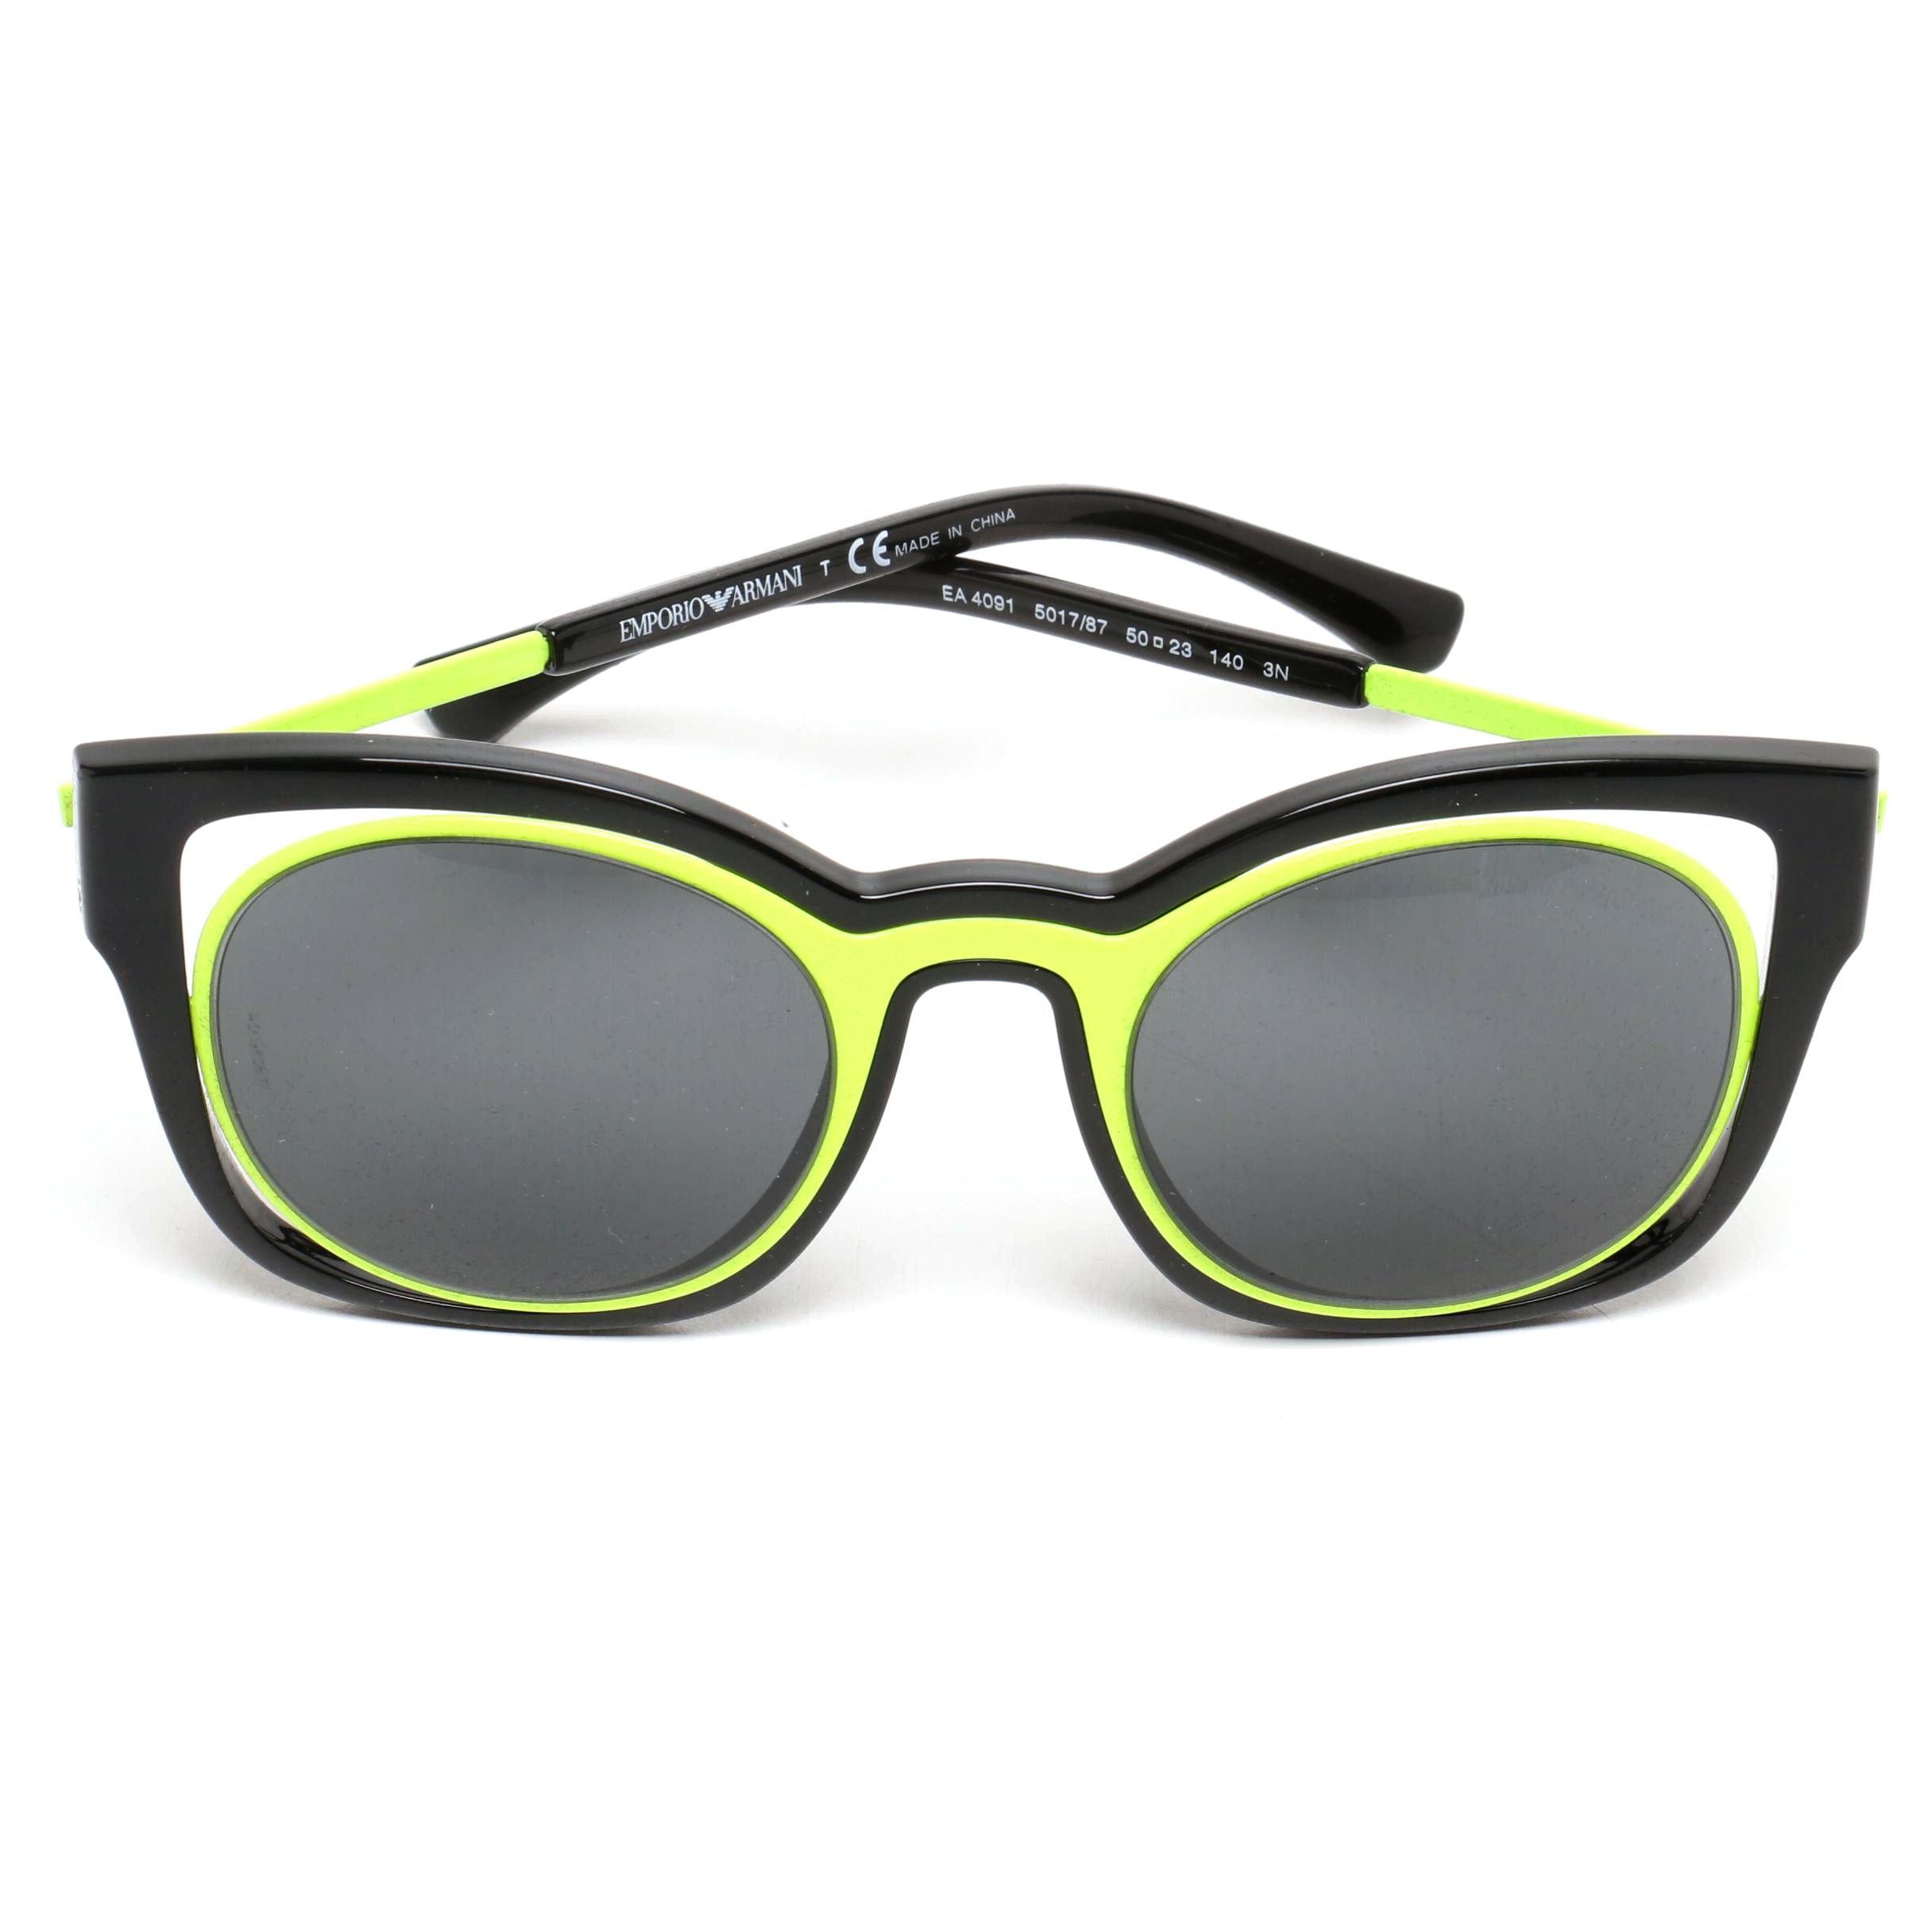 Emporio Armani Black and Neon Yellow Modified Cat Eye Sunglasses with Case